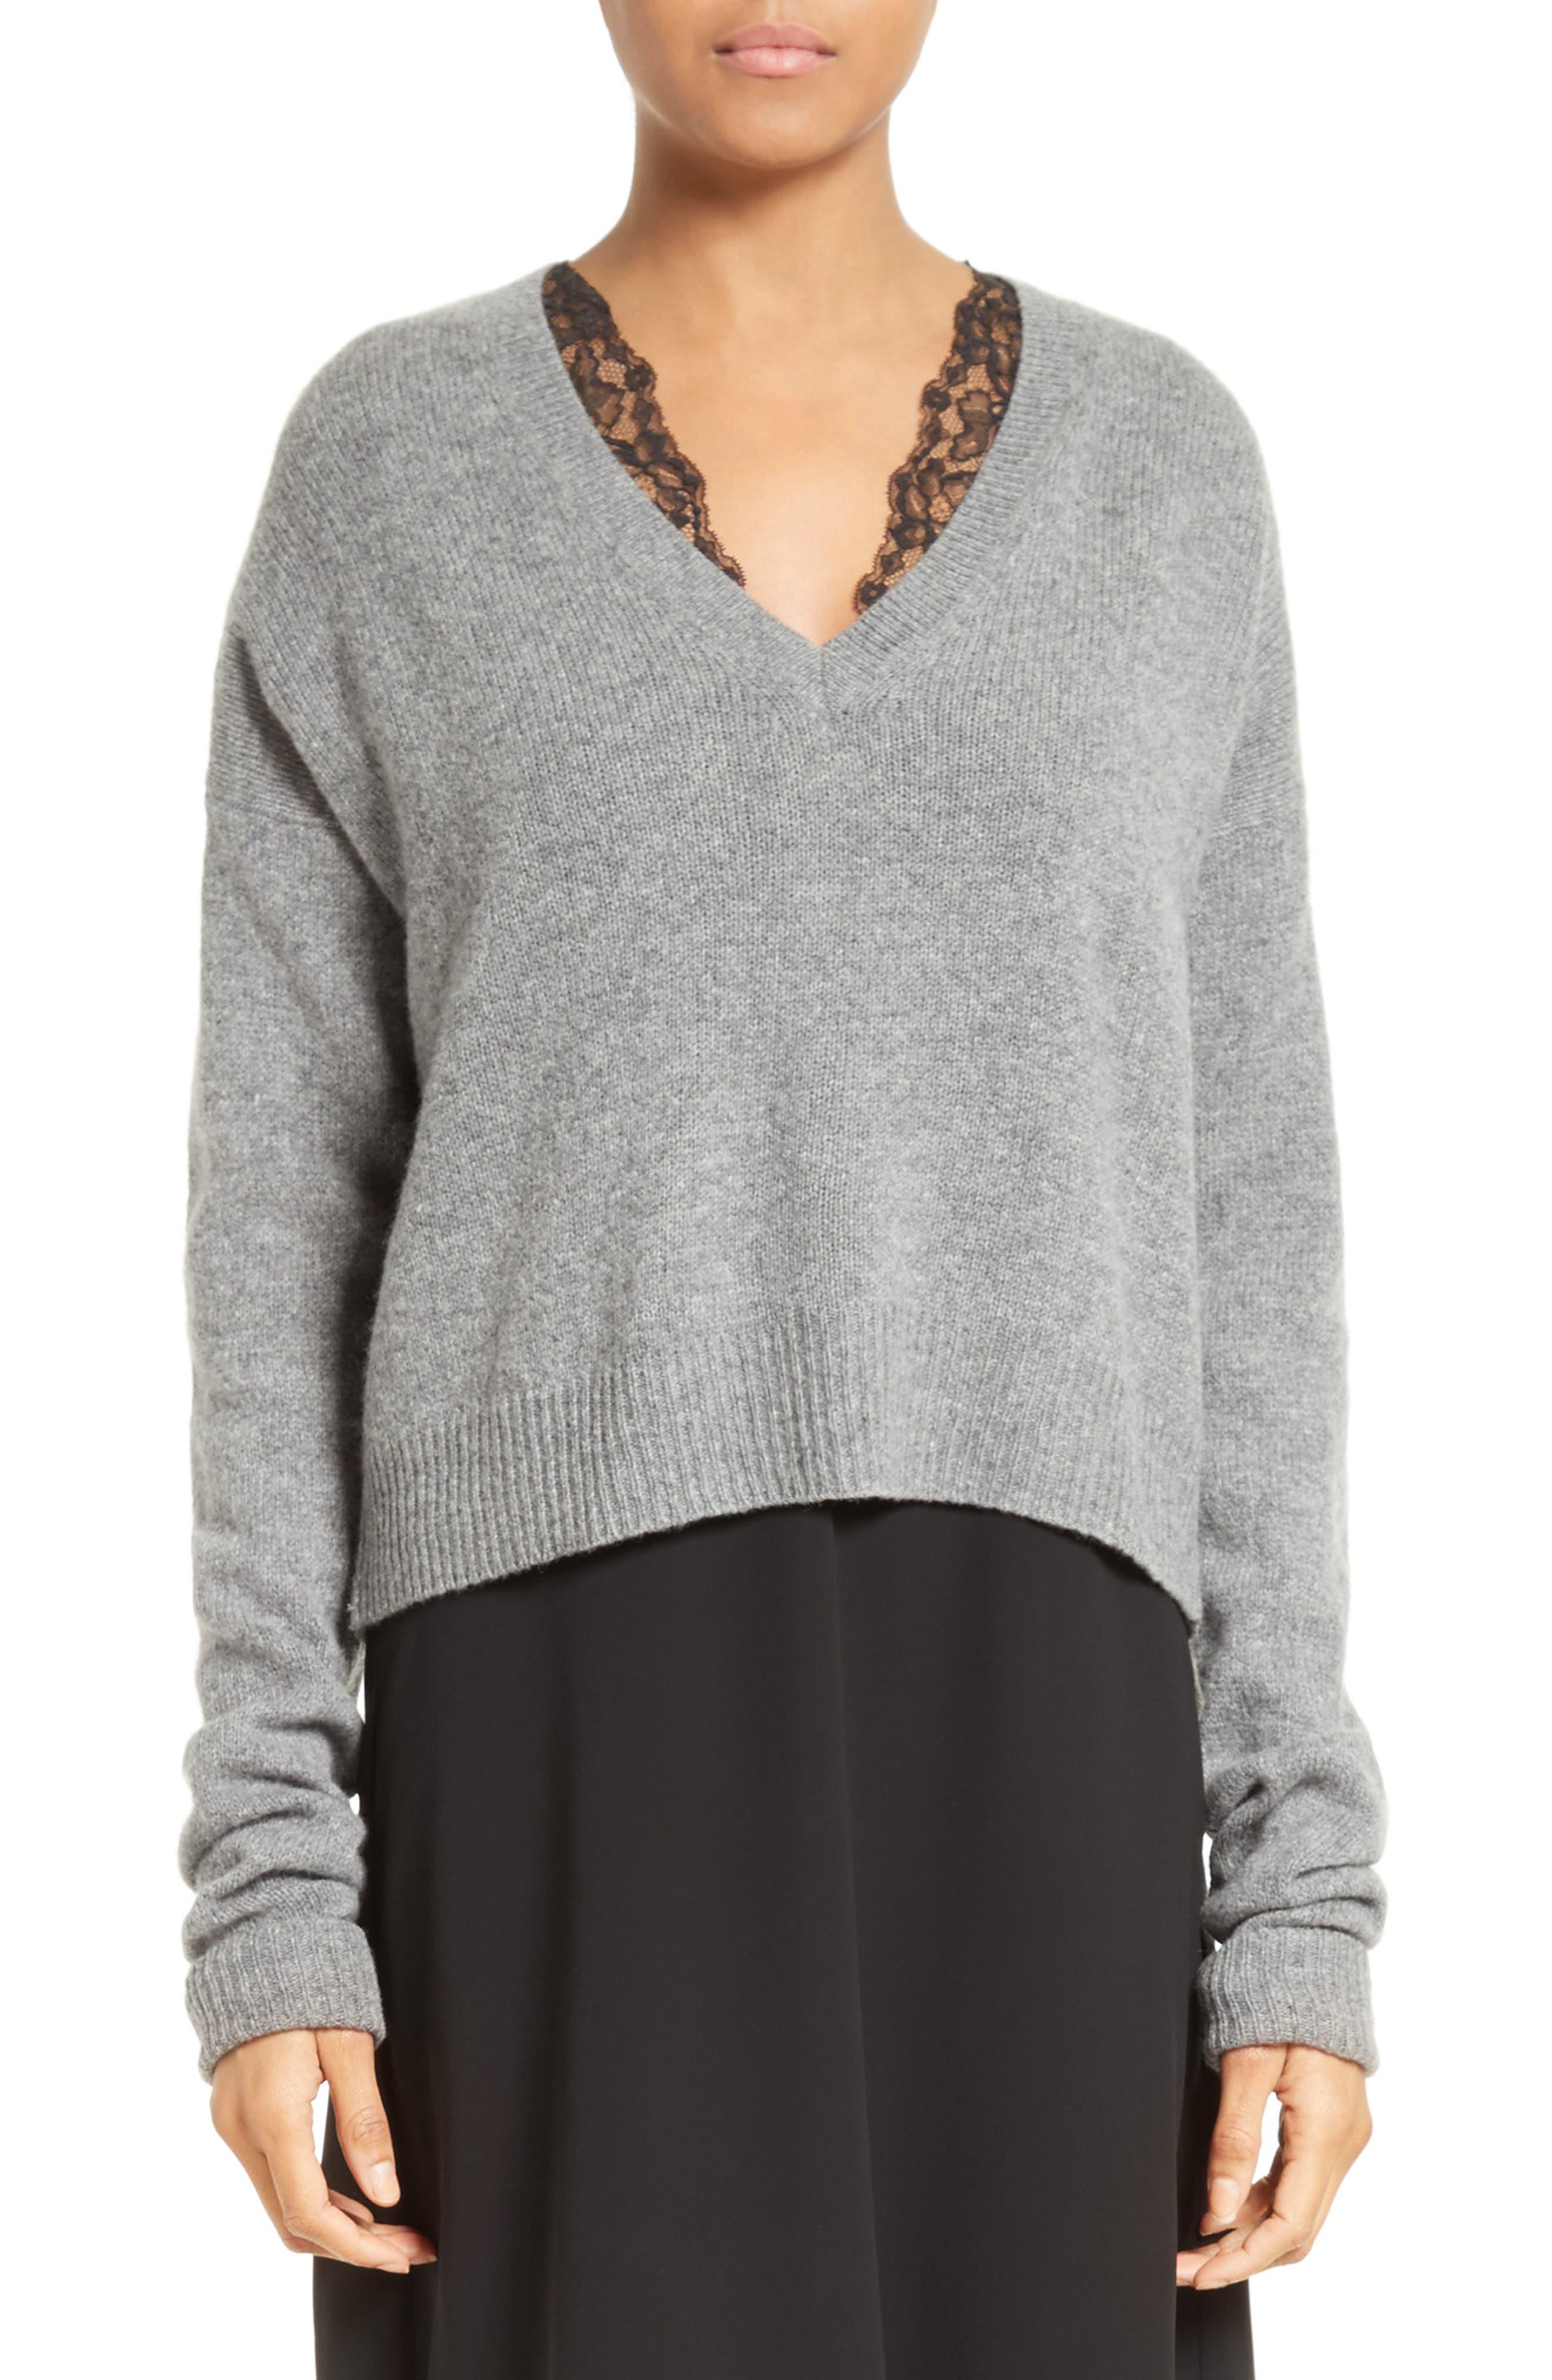 Main Image - McQ Alexander McQueen Wool & Cashmere Cutout Sweater